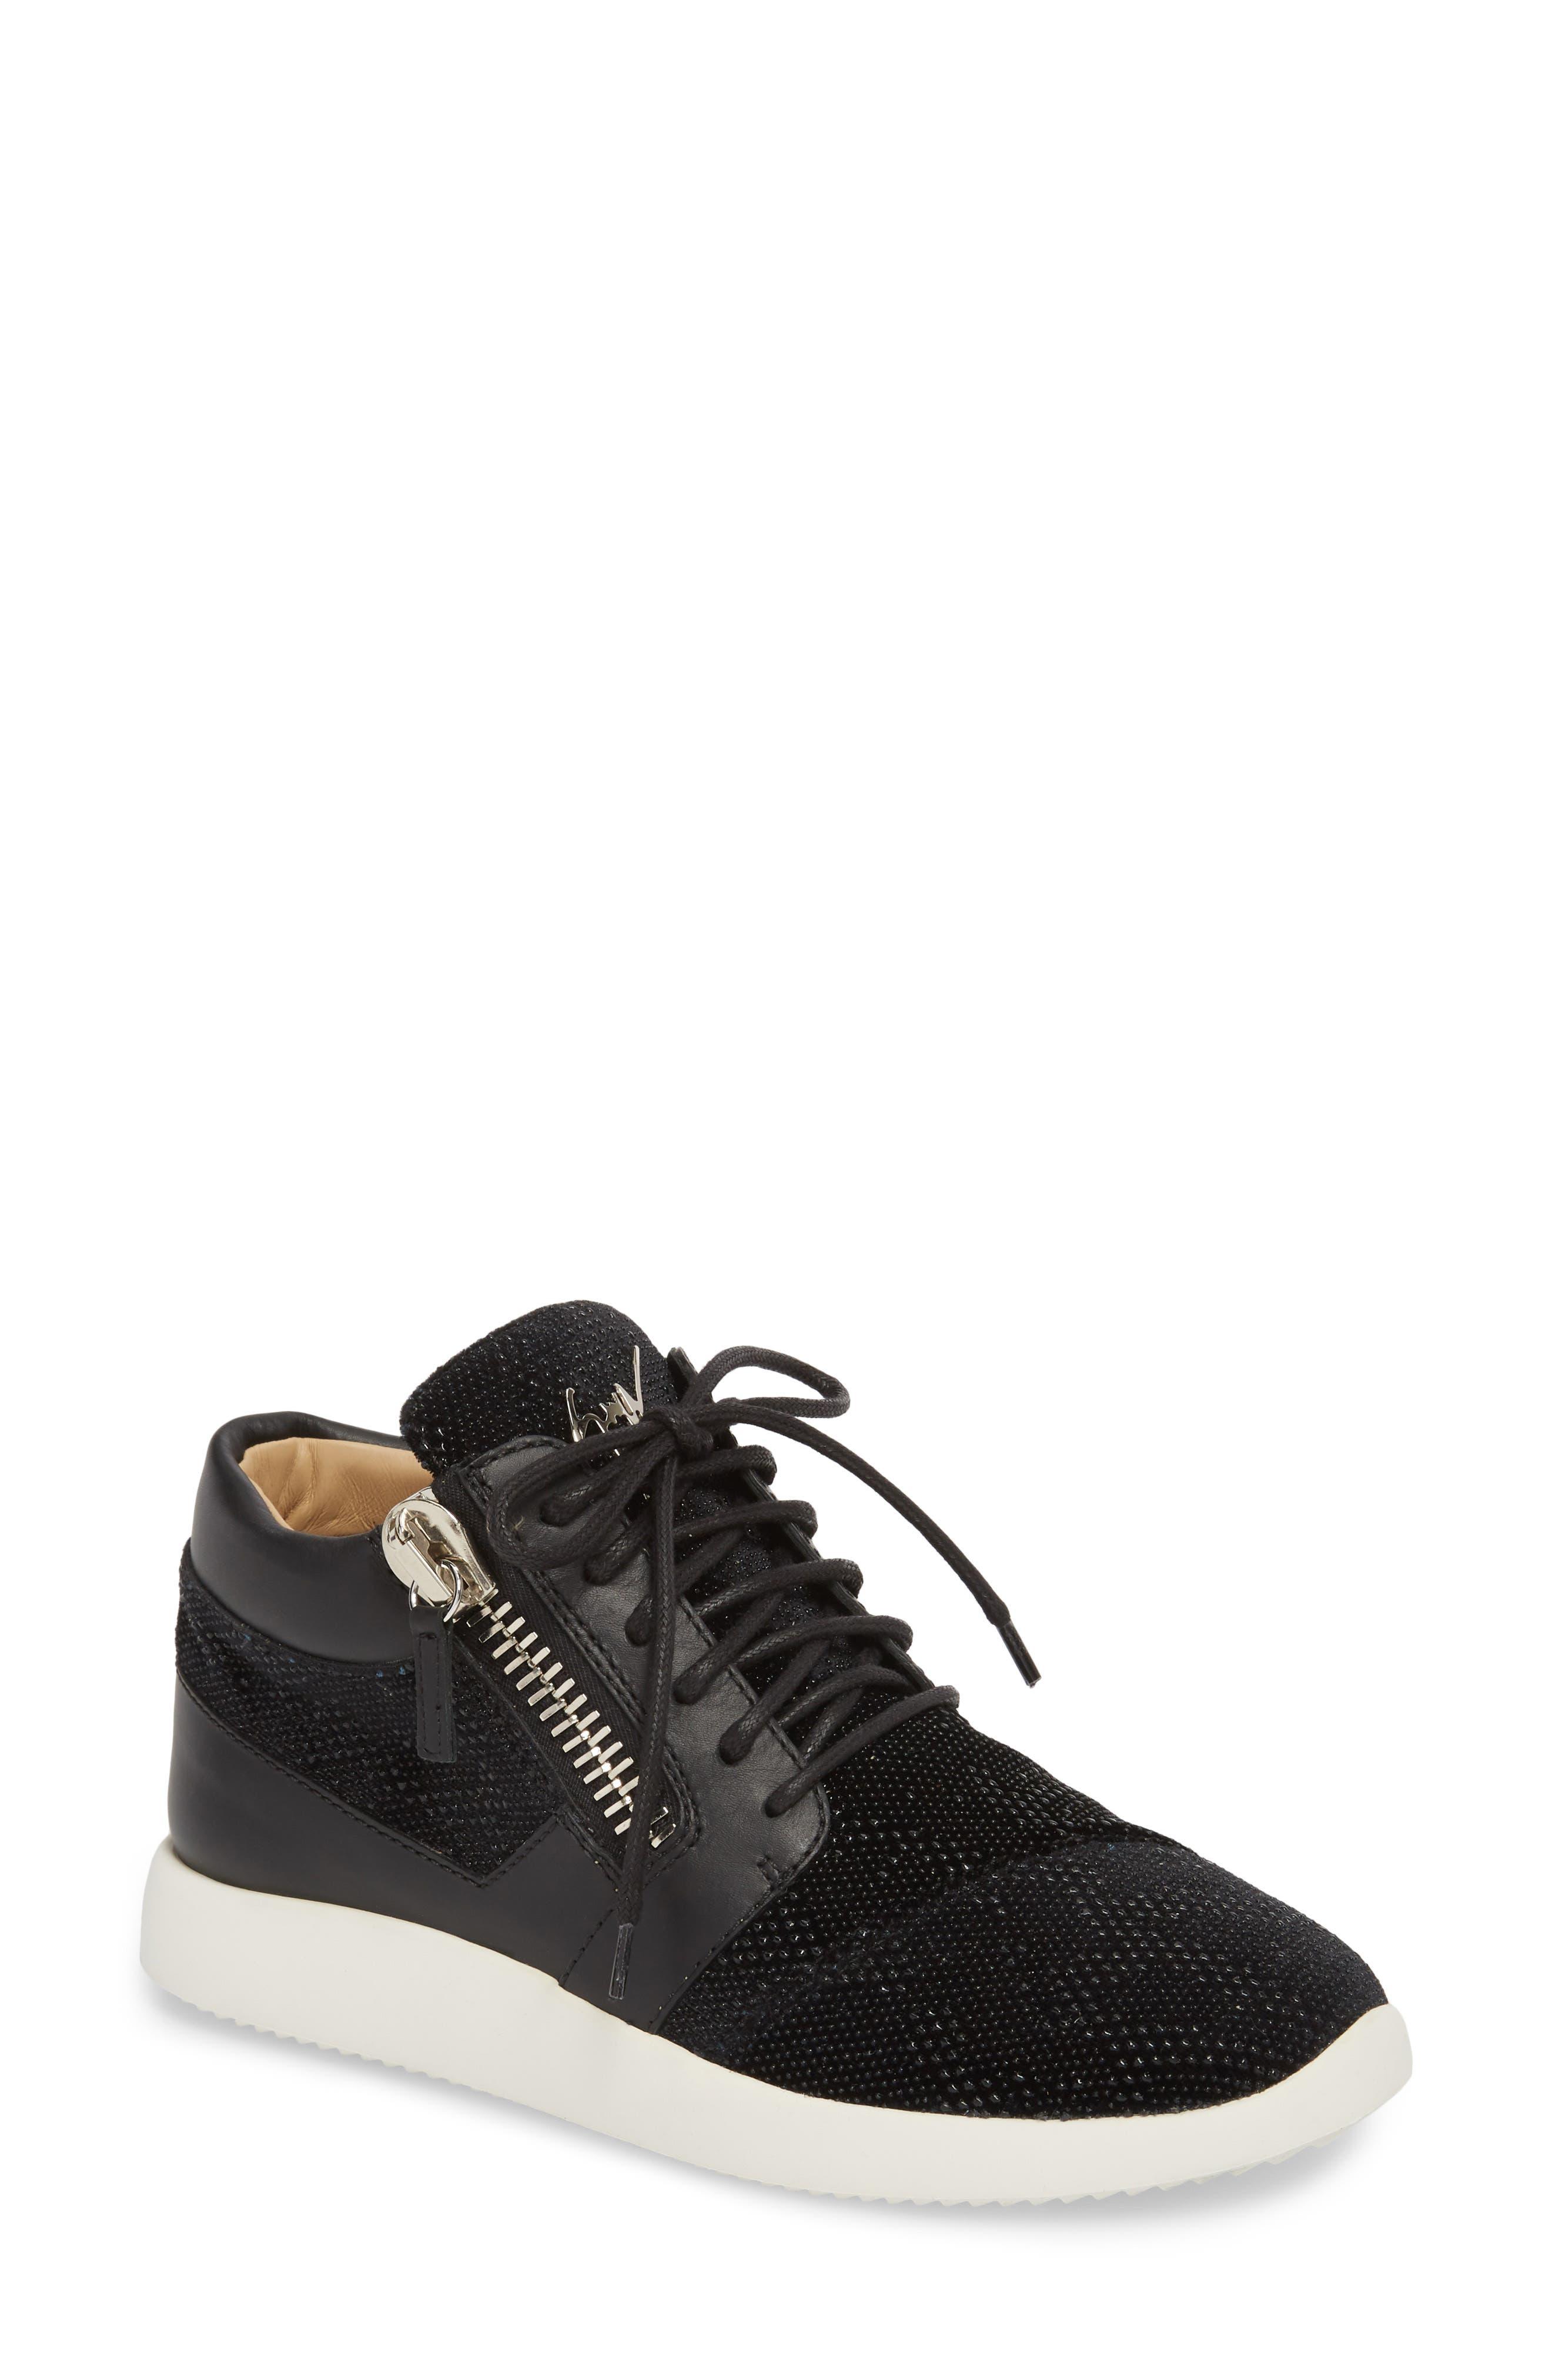 Mid Top Sneaker,                             Main thumbnail 1, color,                             Black